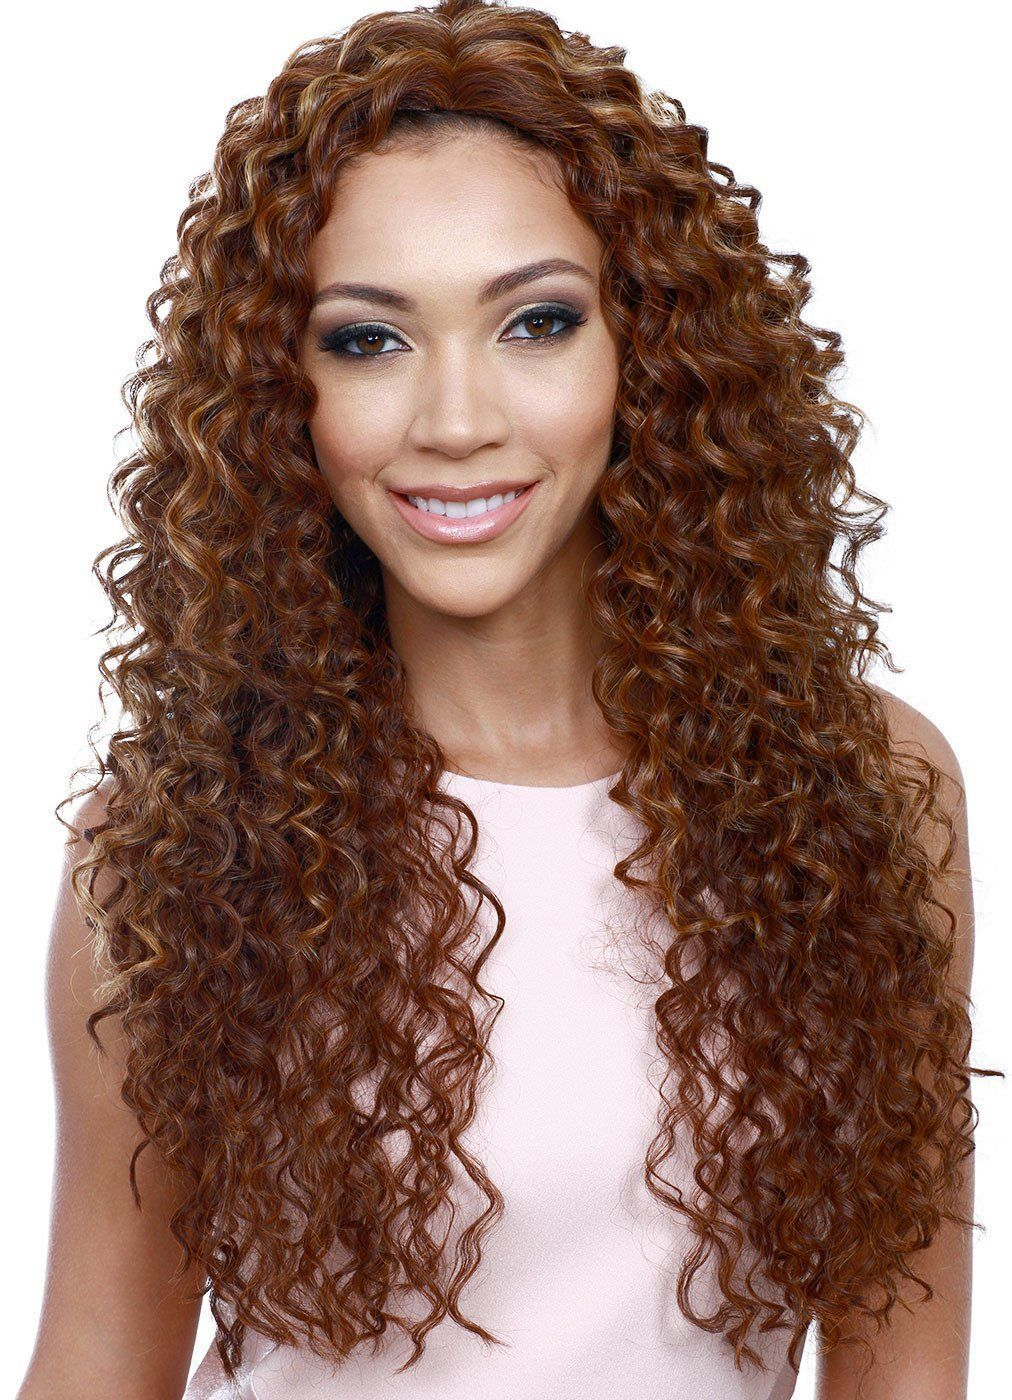 Bobbi Boss Weave A Wig Mwws11 Elvira Pinterest Wig And Quick Weave